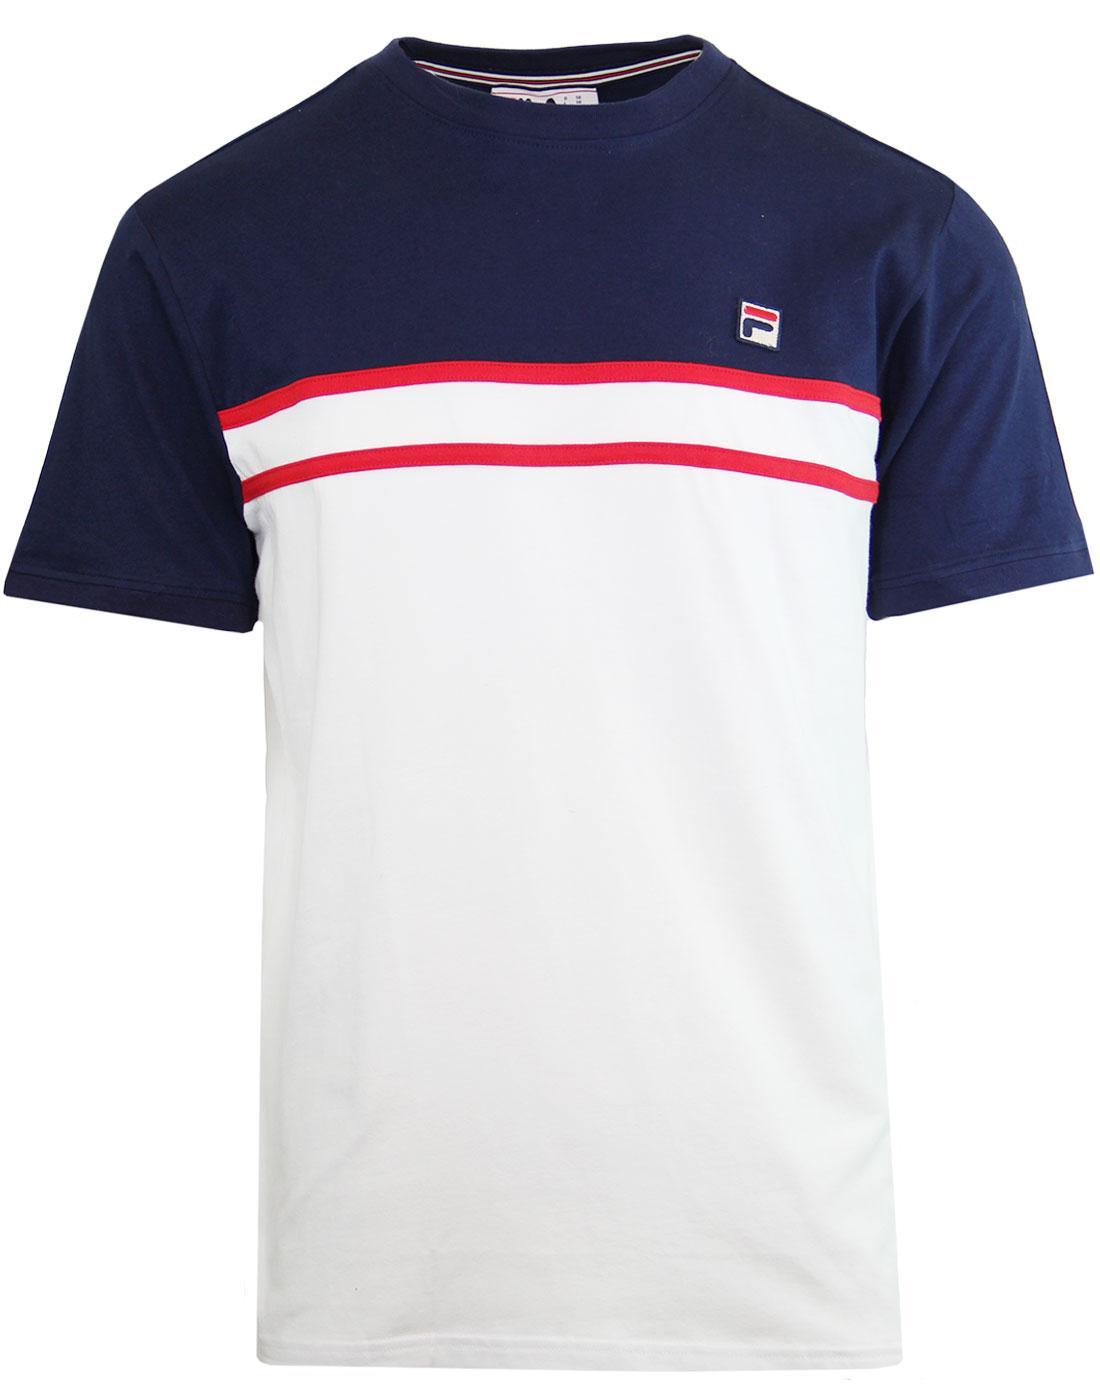 d7f6b60485fd FILA VINTAGE Baldi Retro 80s Cut & Sew T-shirt Peacoat